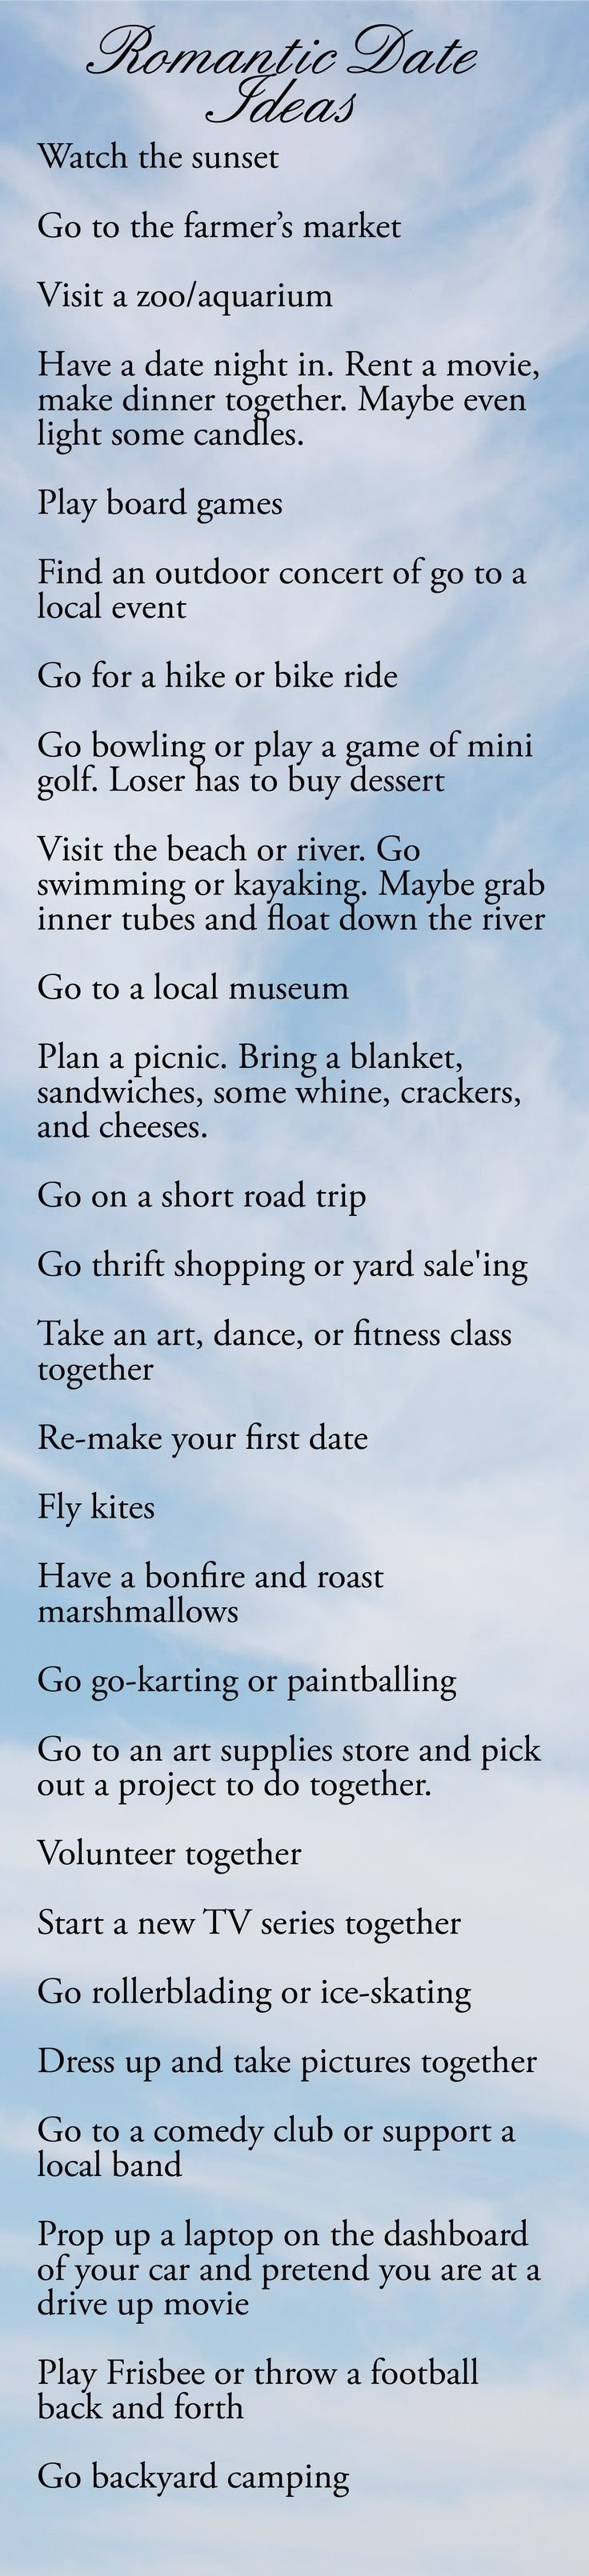 10 Famous Creative Date Ideas For Him 152 best date ideas images on pinterest my love romantic ideas 17 2020